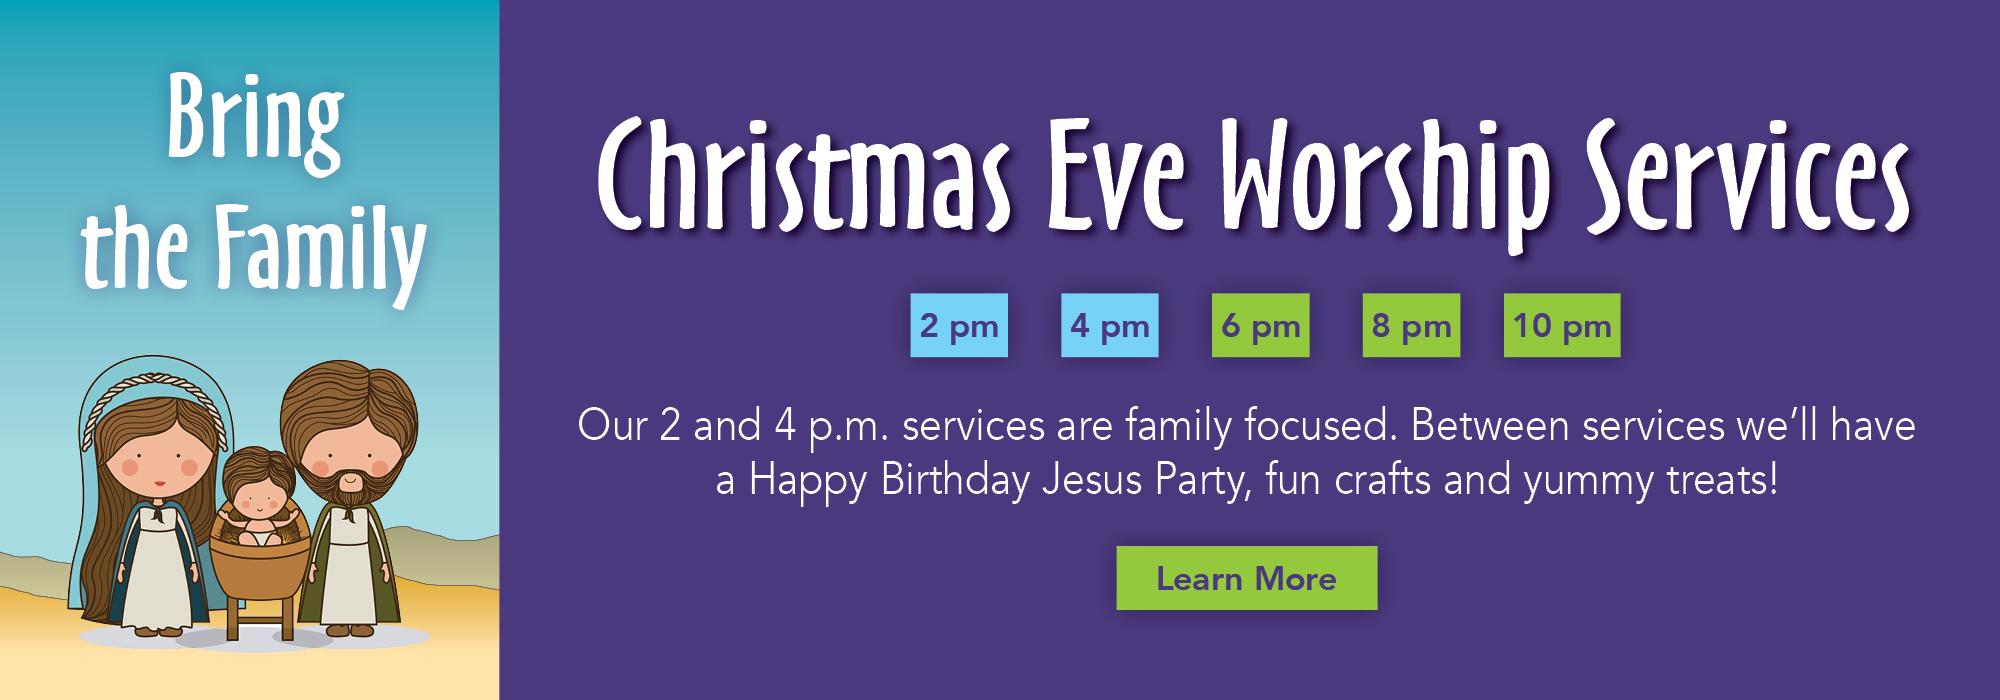 ChristmasEve-Services-YourHub2